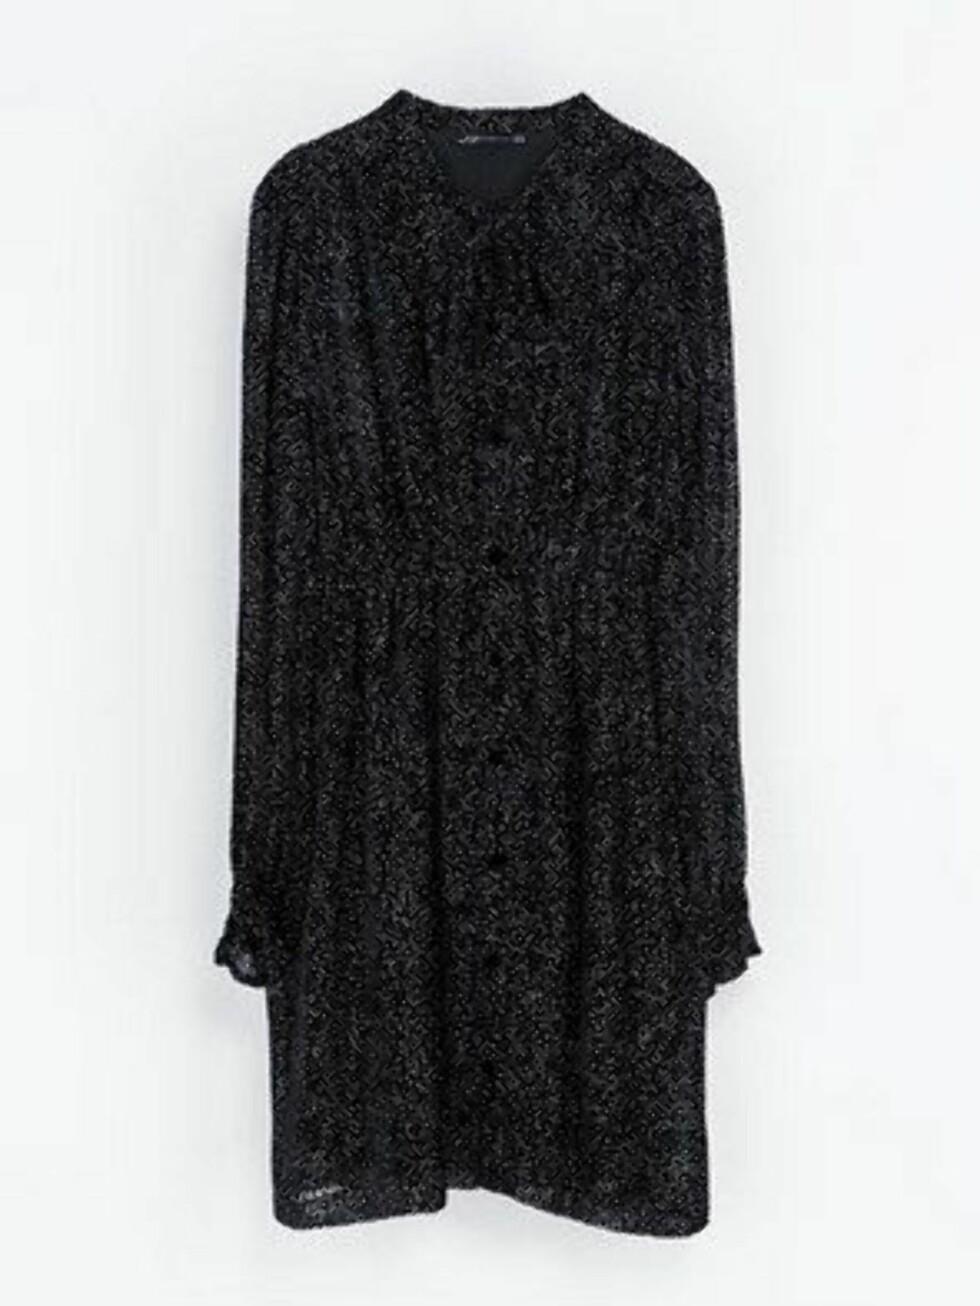 Lekker svart blondekjole. 799 kroner, Zara.no Foto: Produsenten